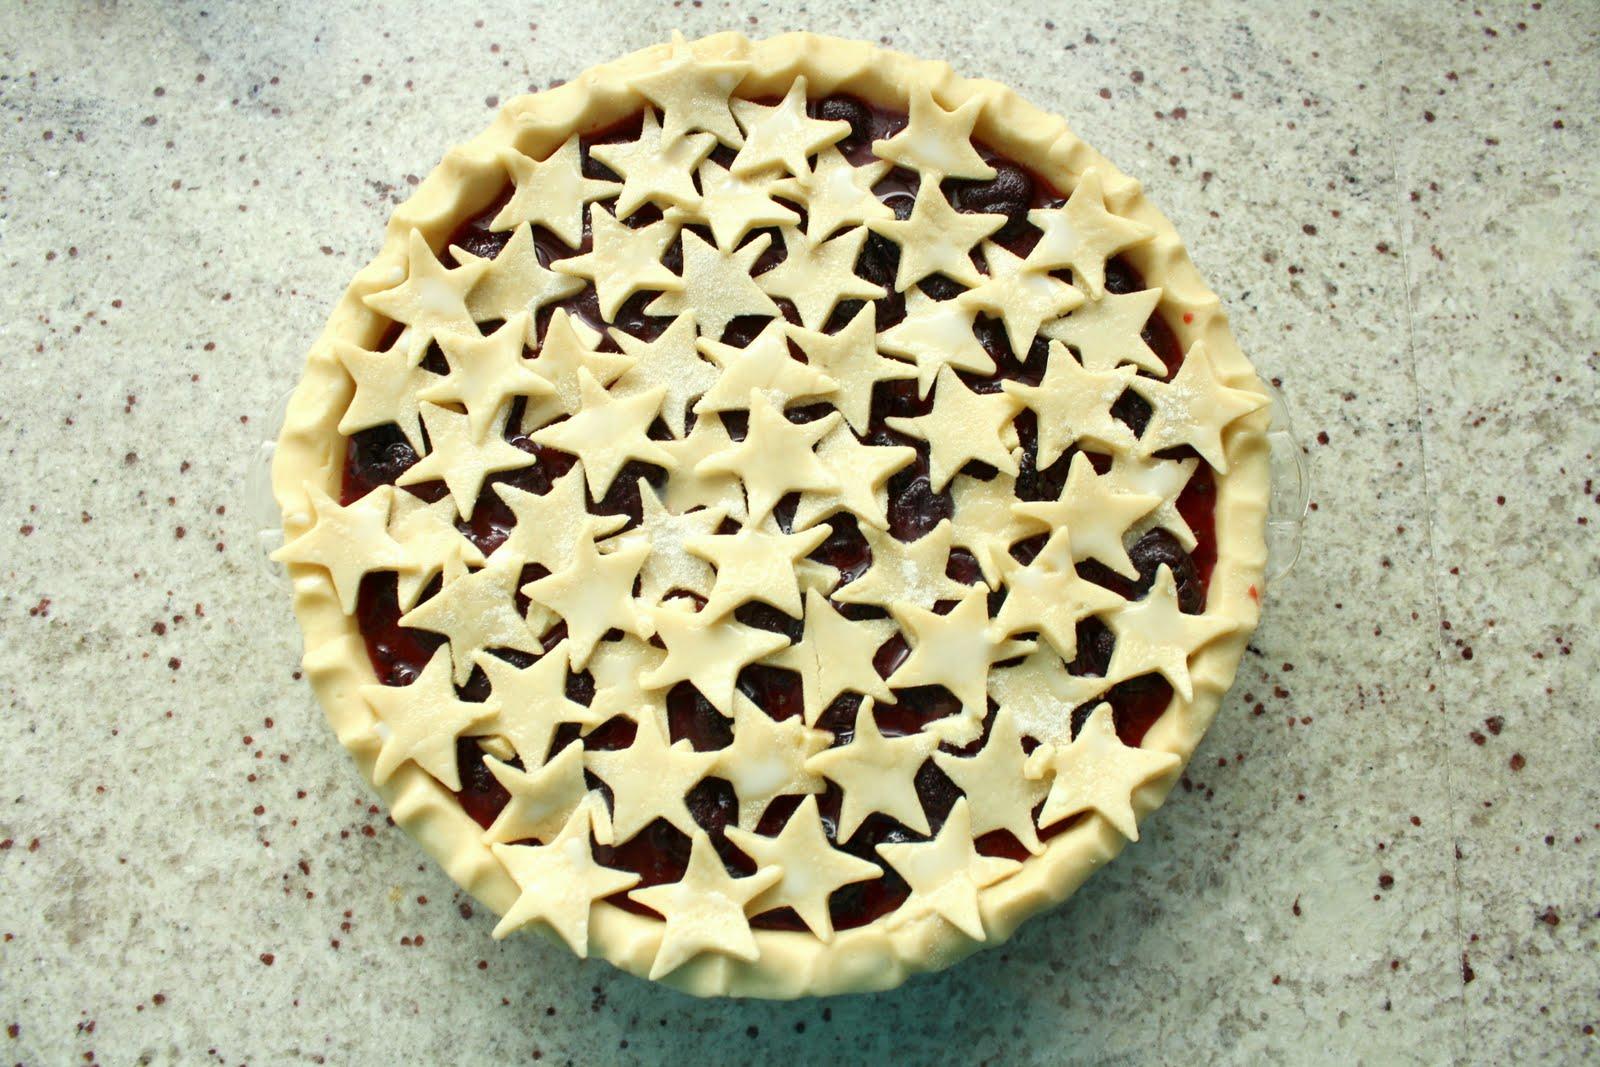 Cave cibum cherry pie for all for Apple pie decoration